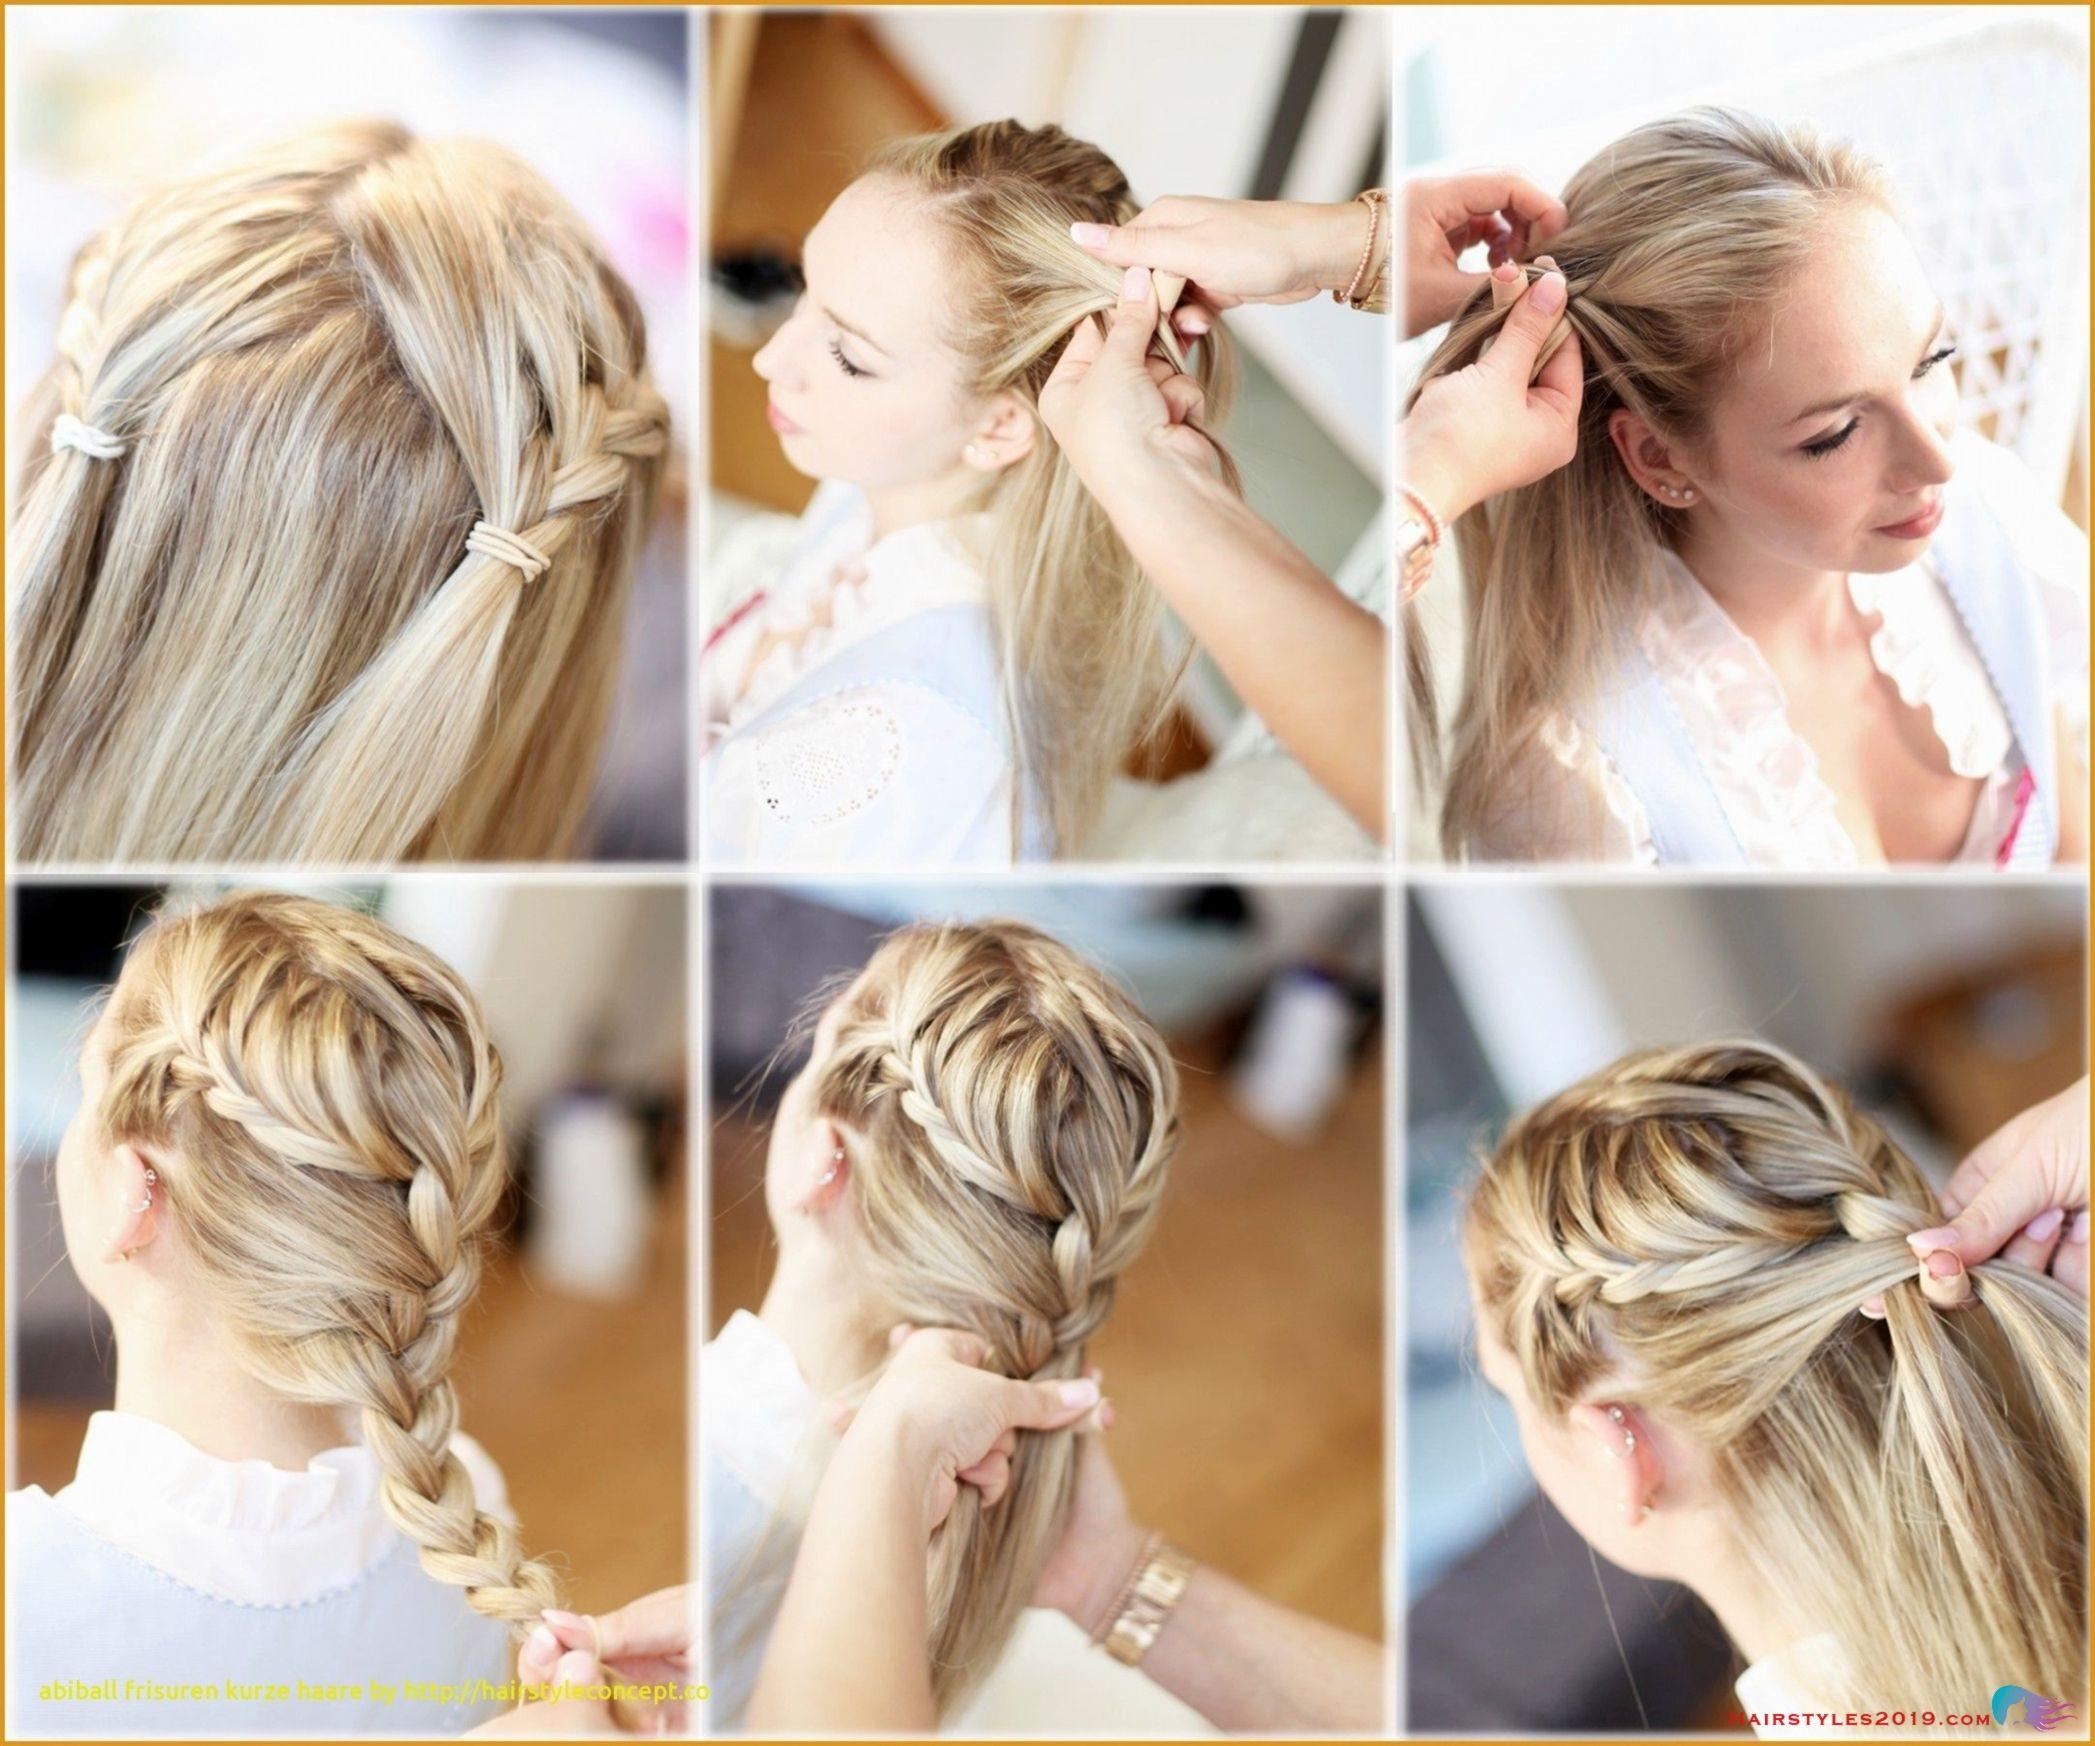 Dirndl Hairstyles Long Hair Tutorial Dirndl Hairstyles Braided Hair Dirndl Hair Tutorial Di Dirndl Frisuren Kurze Haare Dirndl Frisur Lang Geflochtene Frisuren